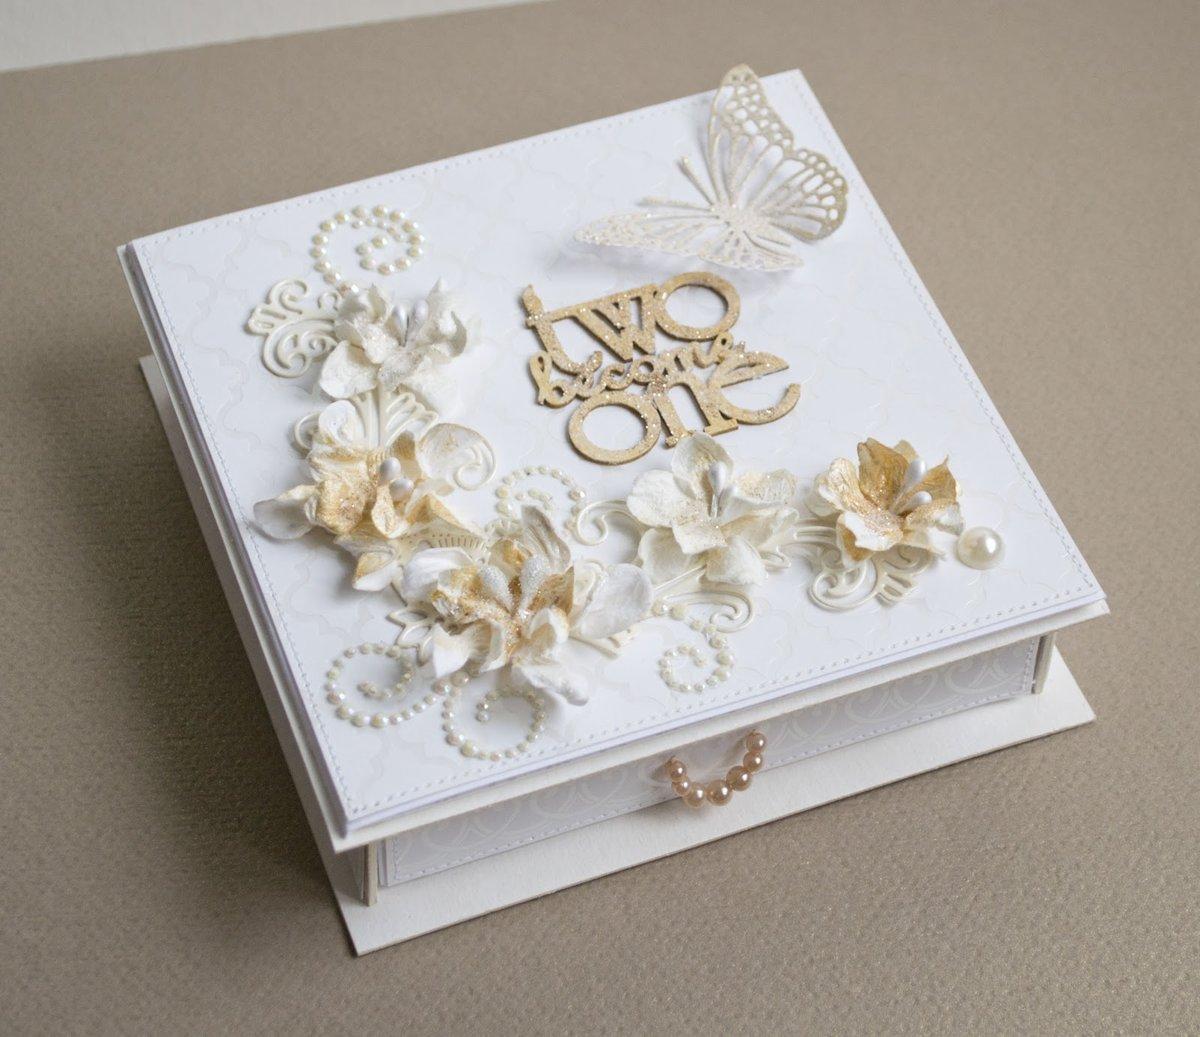 Что дарят на свадьбу родители жениха - идеи подарков, фото 77